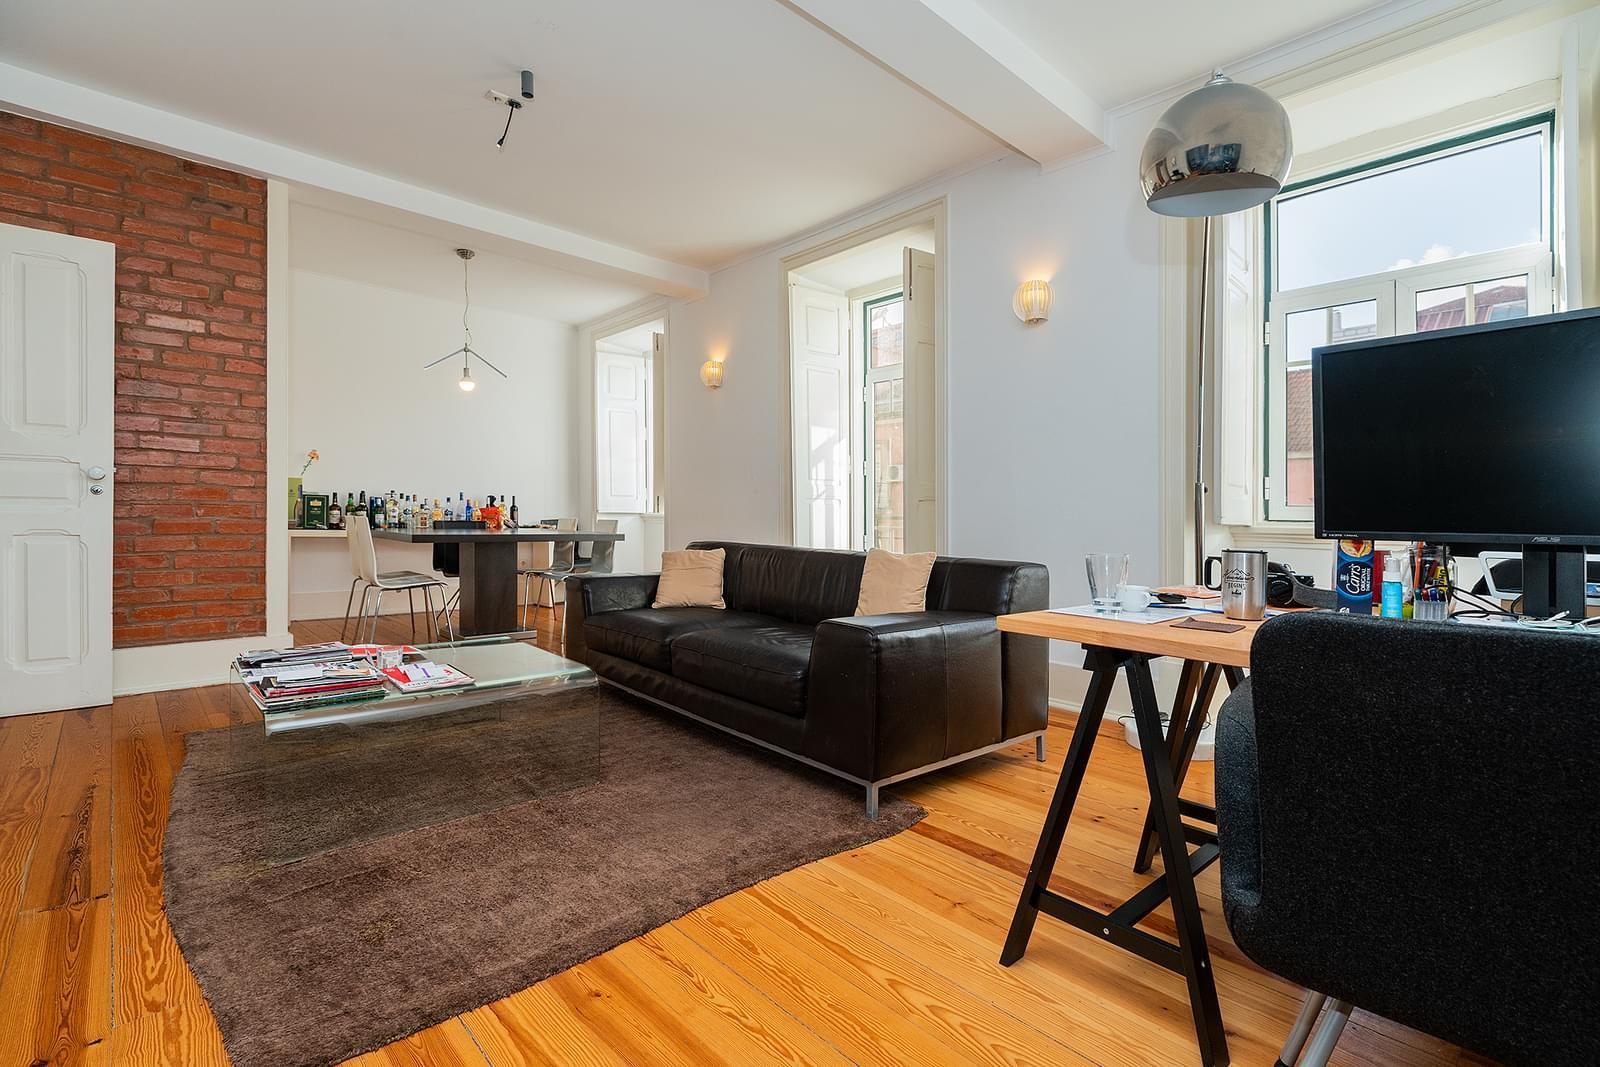 pf18211-apartamento-t2-1-lisboa-d78a0400-7391-46e7-8b51-68c08bdf03de